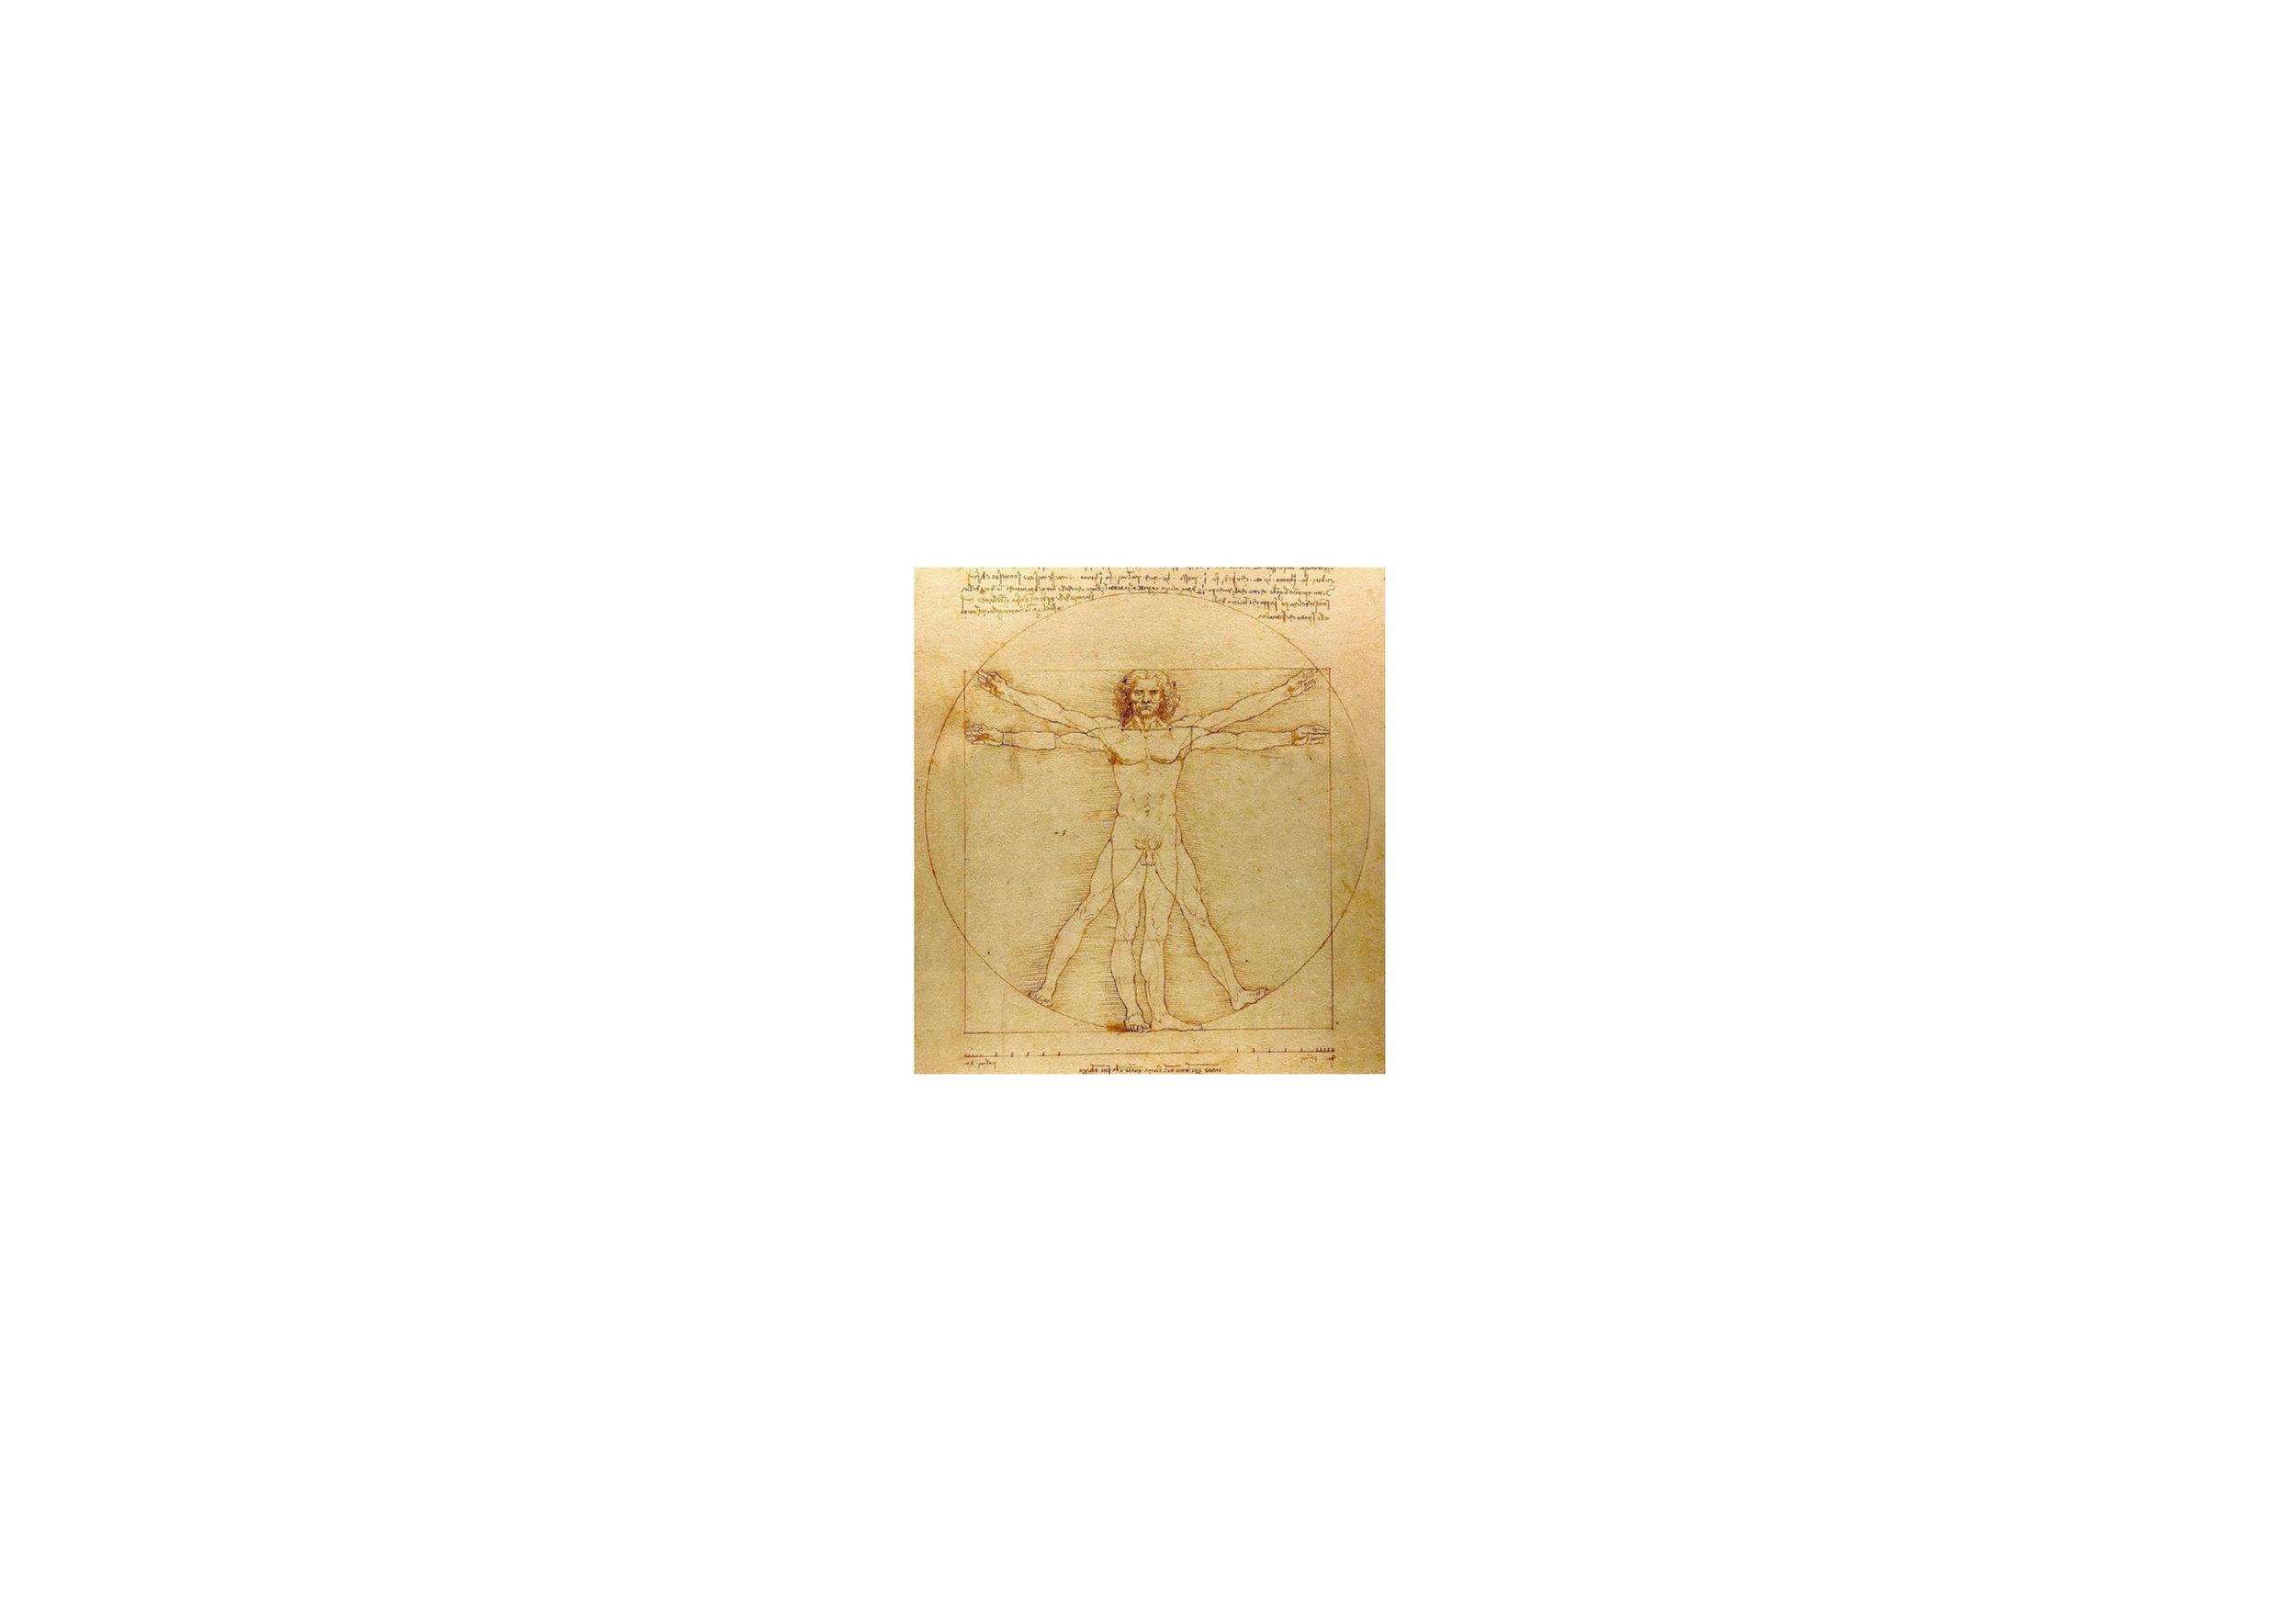 190207 FULCRUM CONCEPT WIP-03.jpg